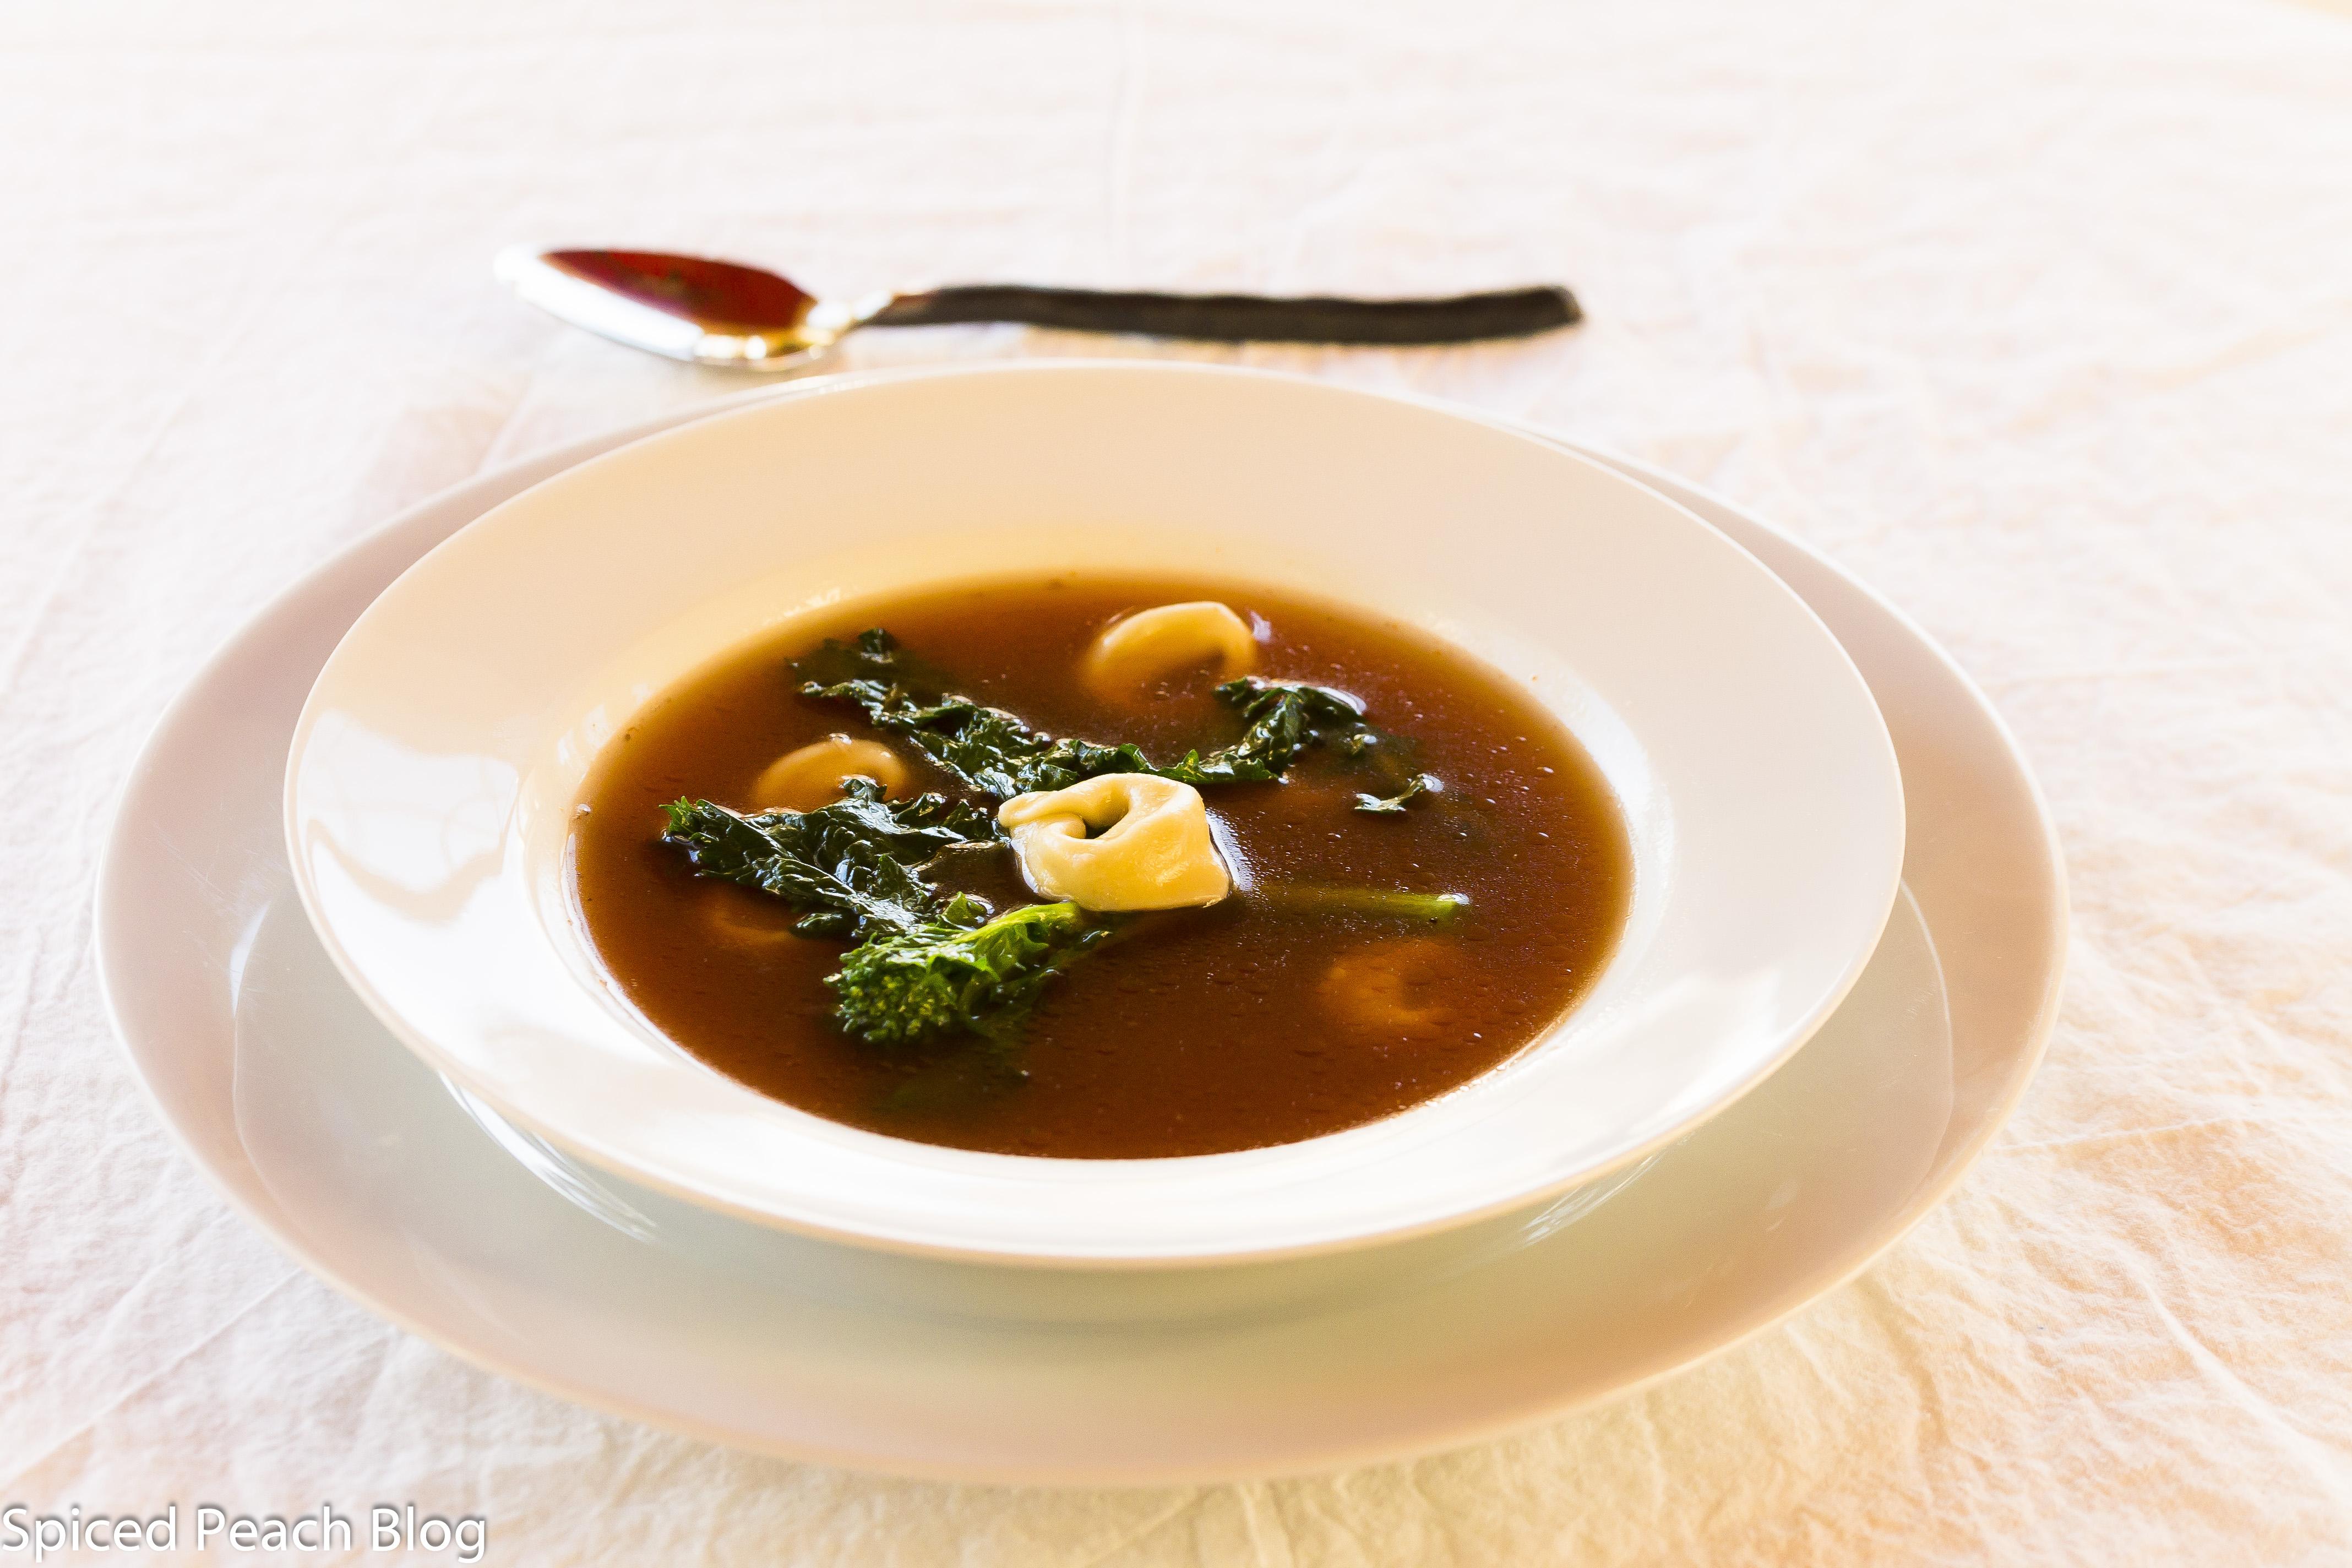 """Brodo"" Grass Fed Beef Broth, Tortellini, Broccoli Rabe"